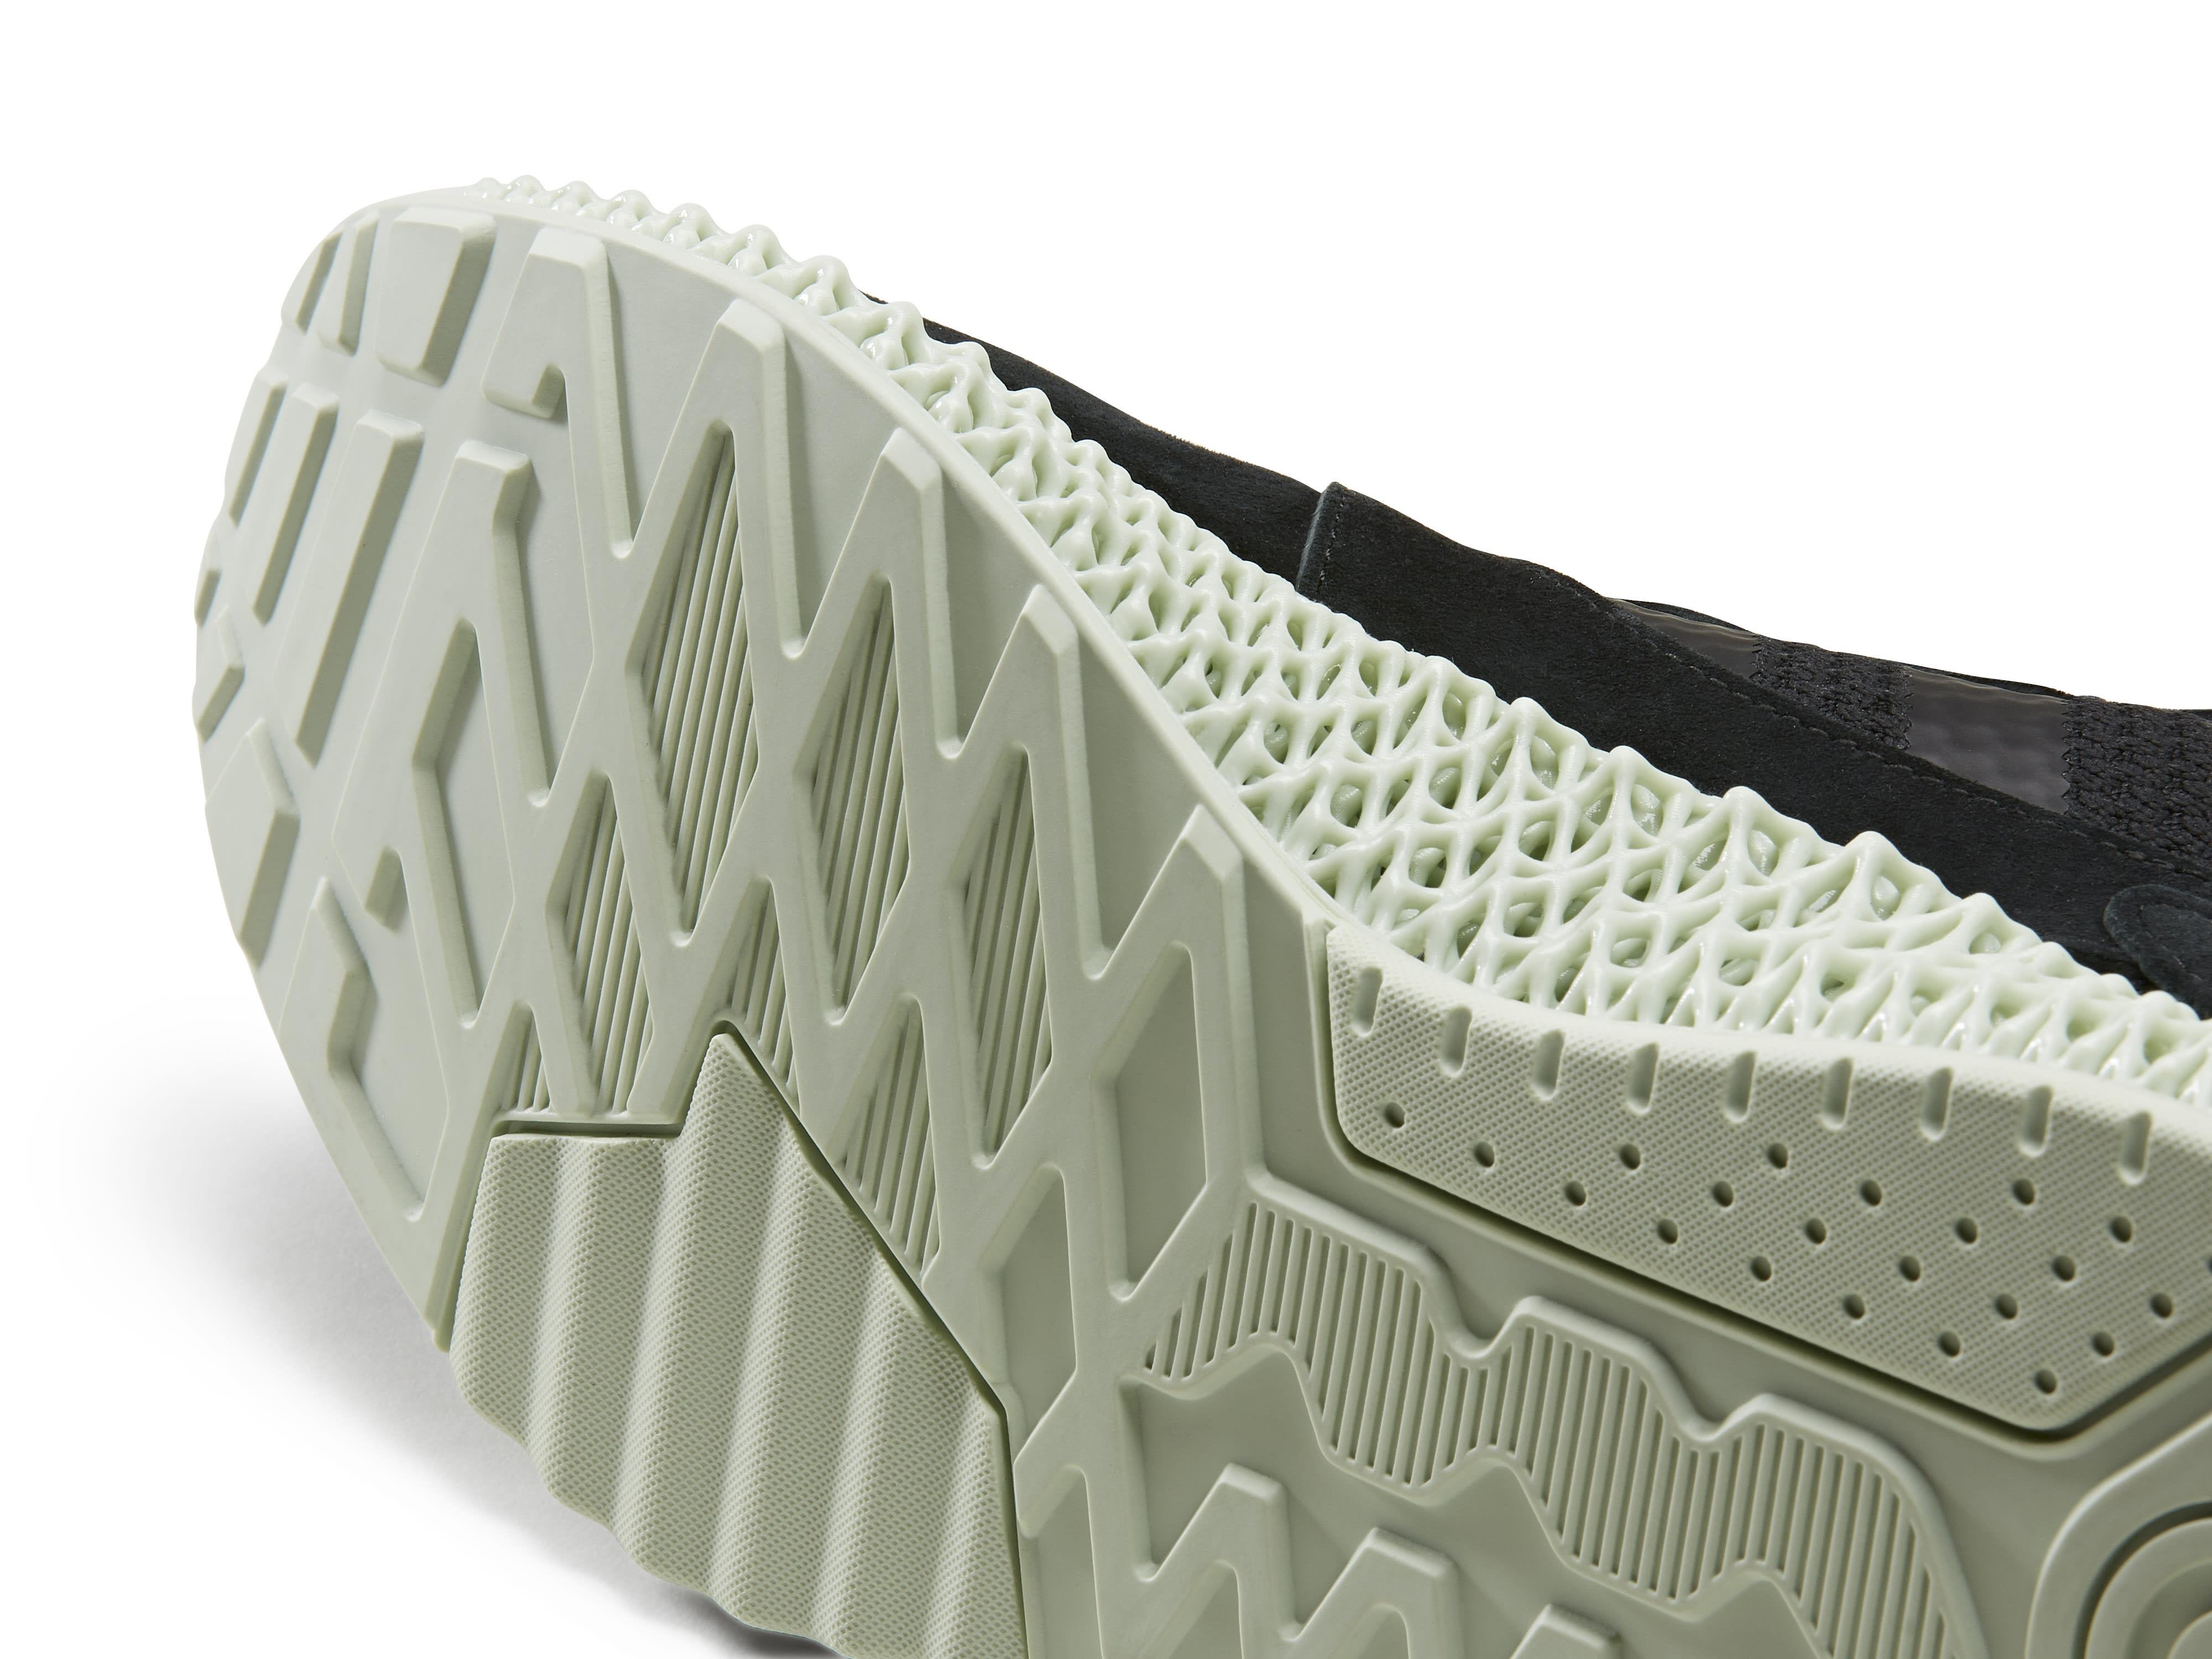 Hender Scheme x Adidas ZX 4000 4D F36147 (Outsole)